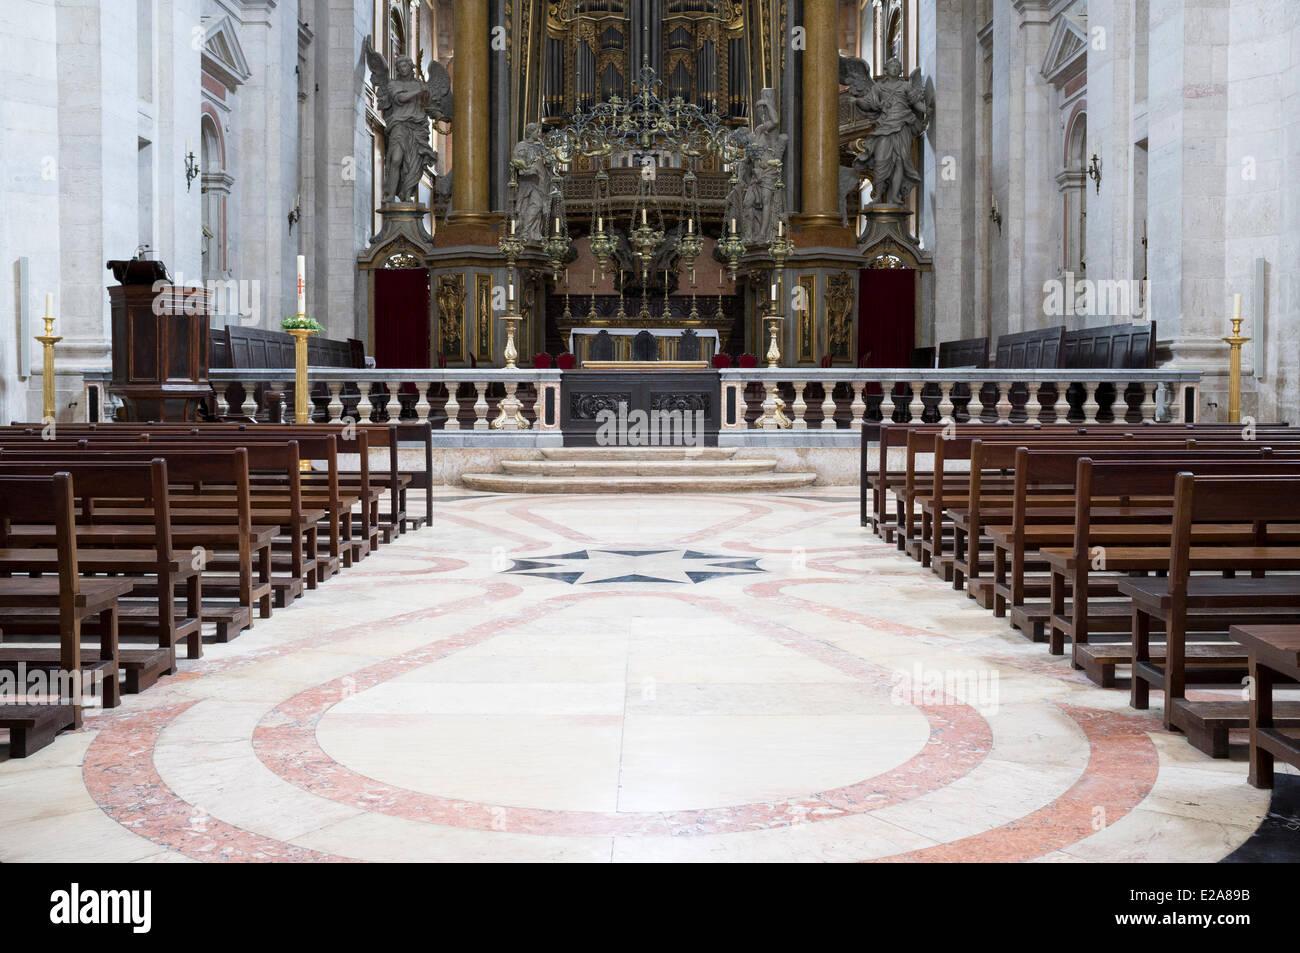 Portugal, Lisbon, the church of the monastery Sao Vicente de Fora Stock Photo